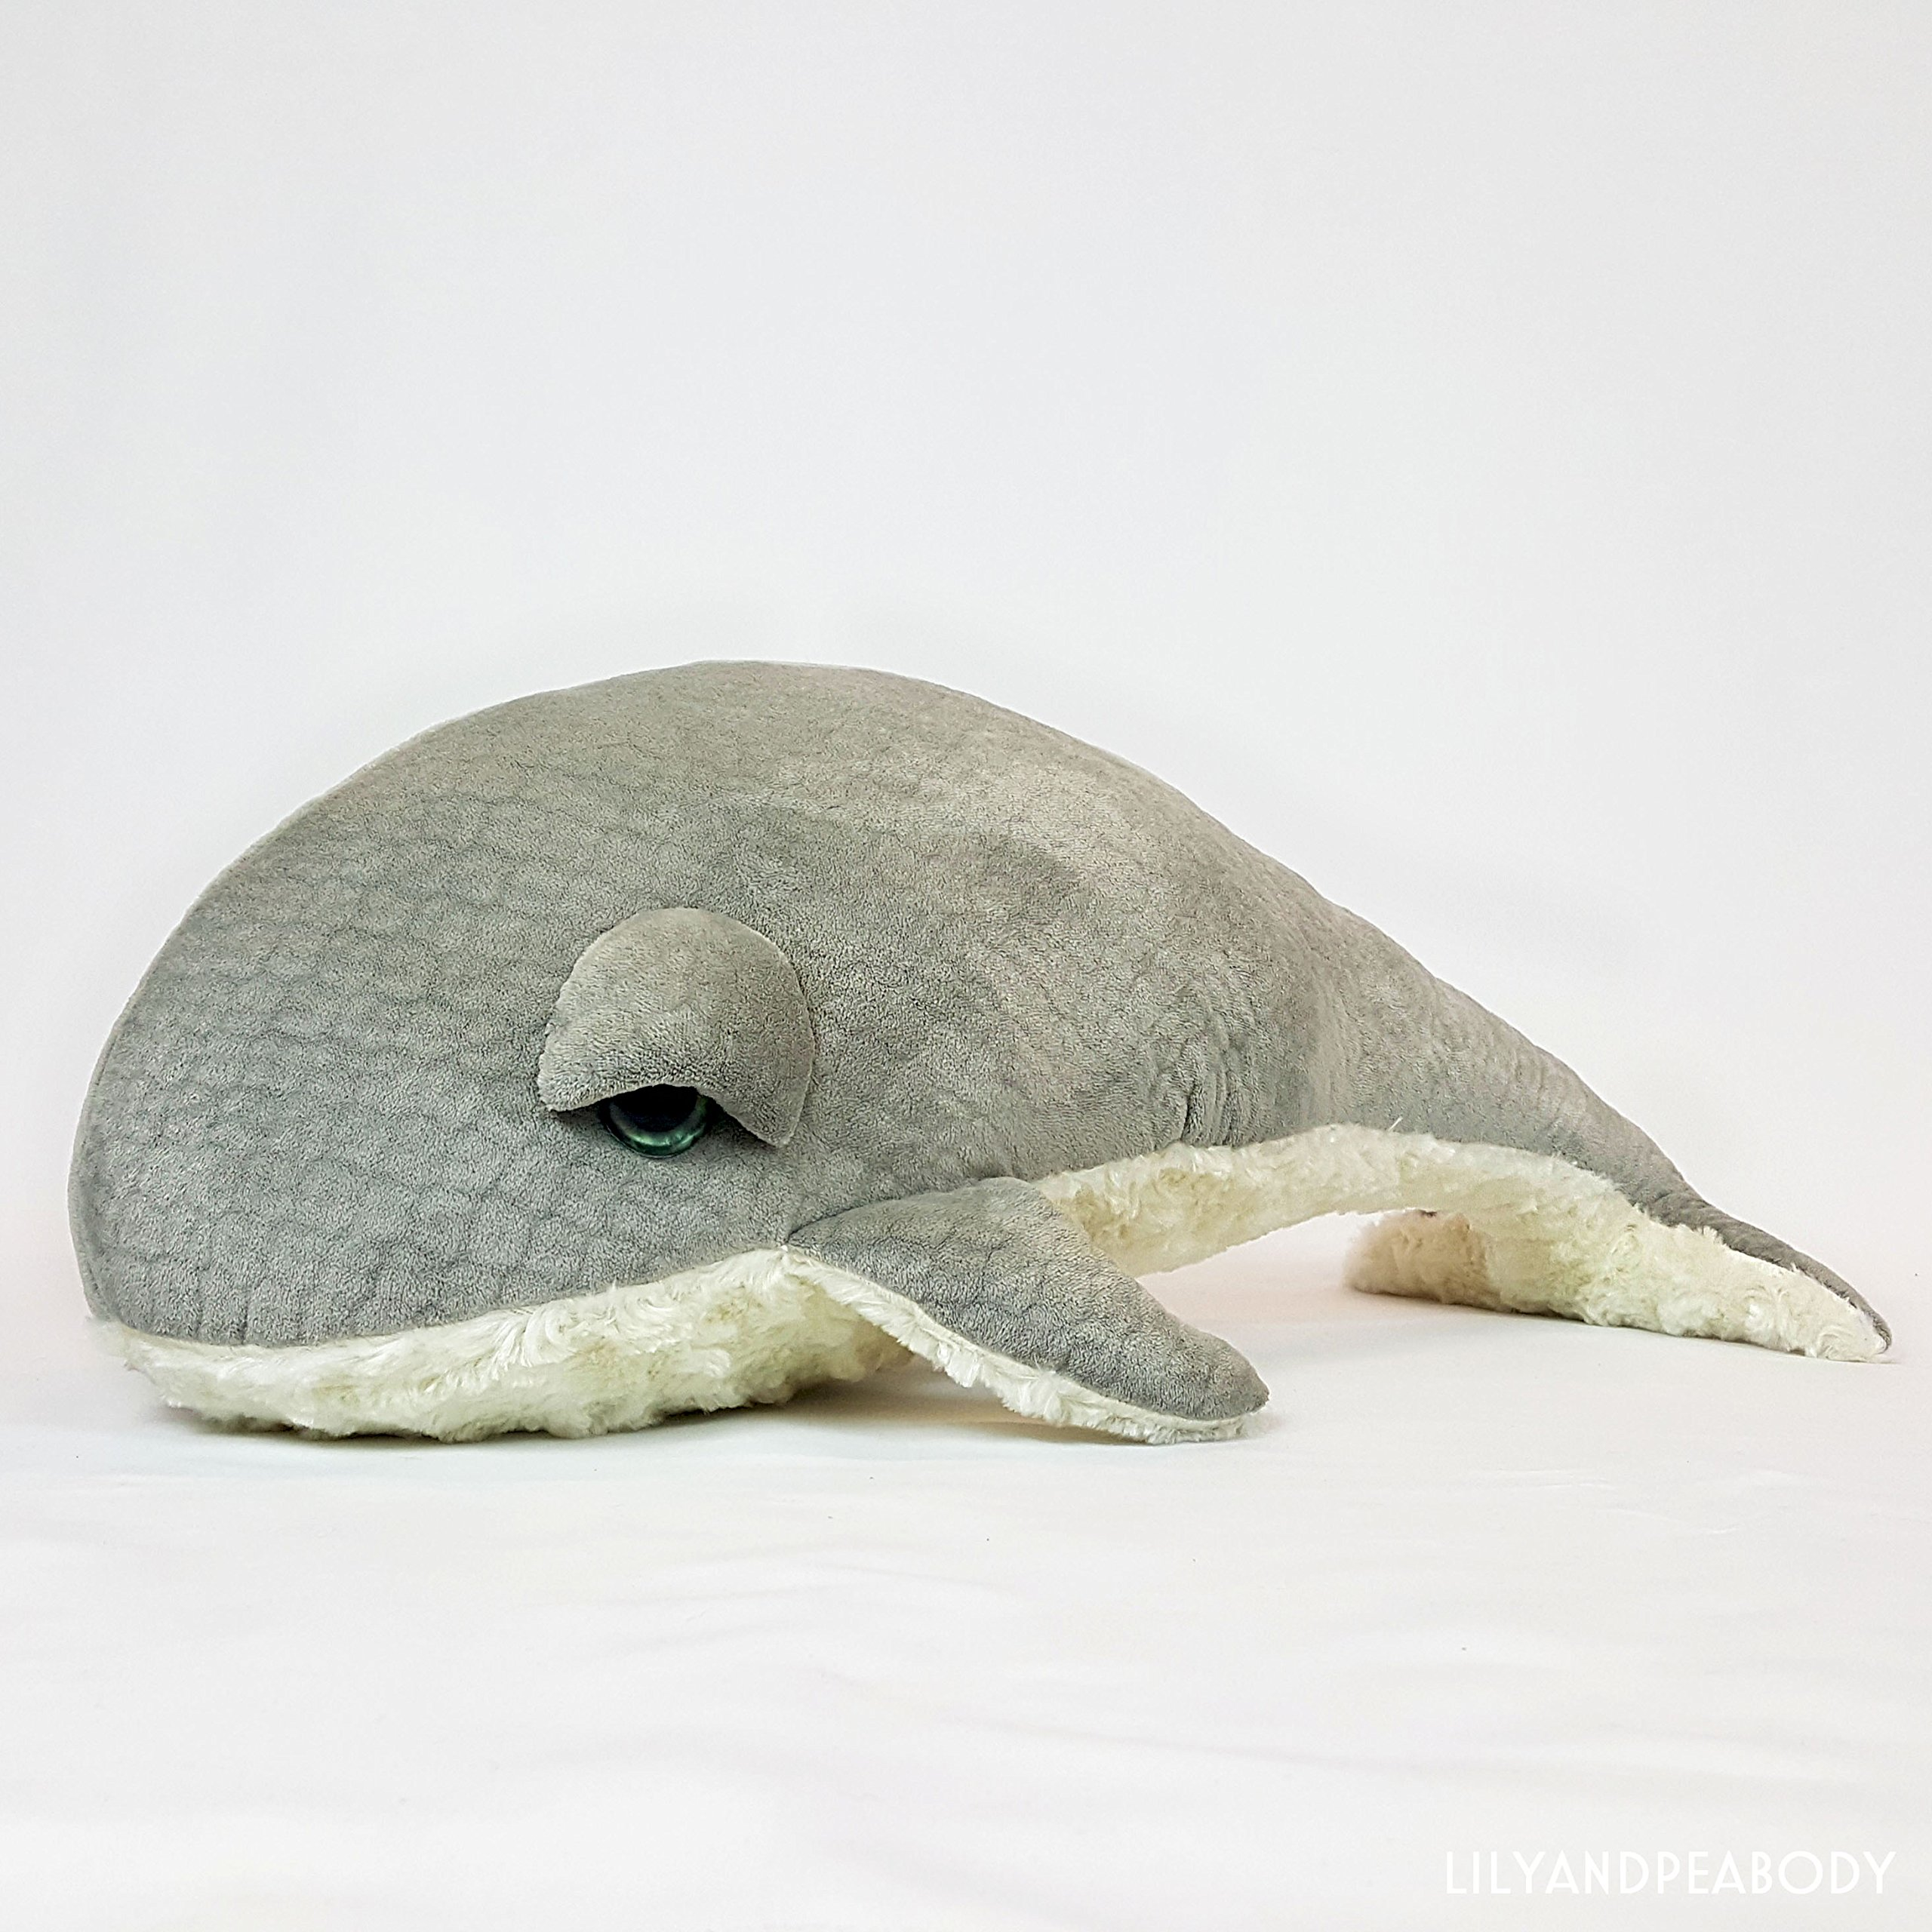 Whale Plush Stuffed Animal, Sea Creature Stuffed Animal, Ocean Life Soft Sculpture, Grey Whale Nursery Decor, Nautical Marine Animal